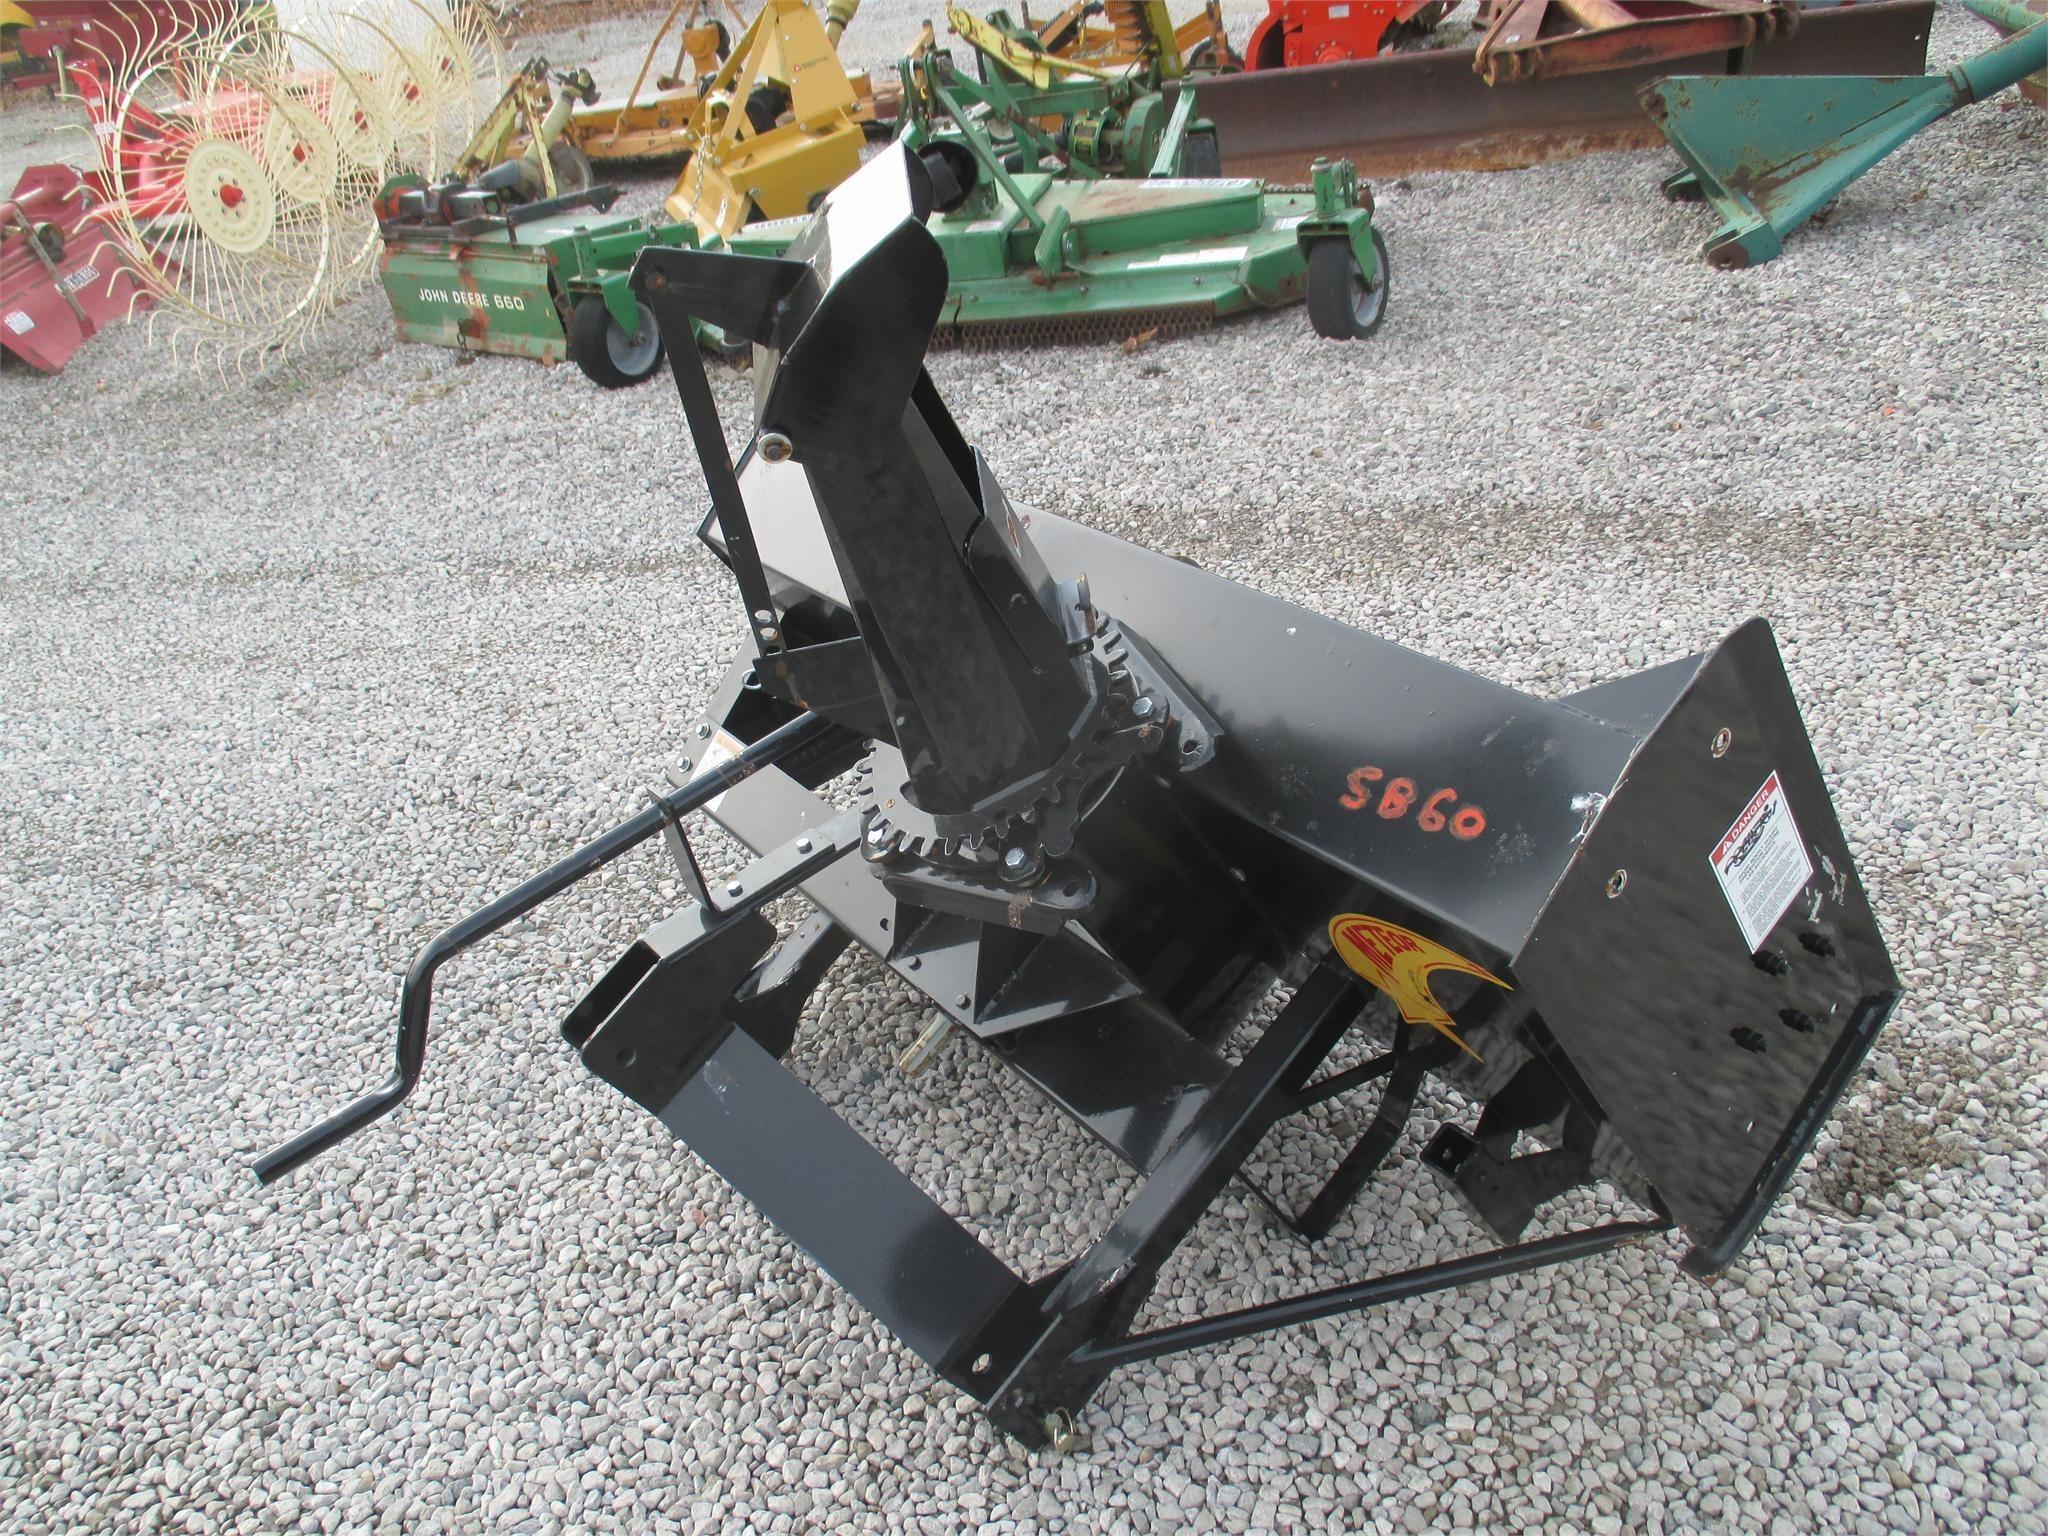 MK Martin SB60 Snow Blower